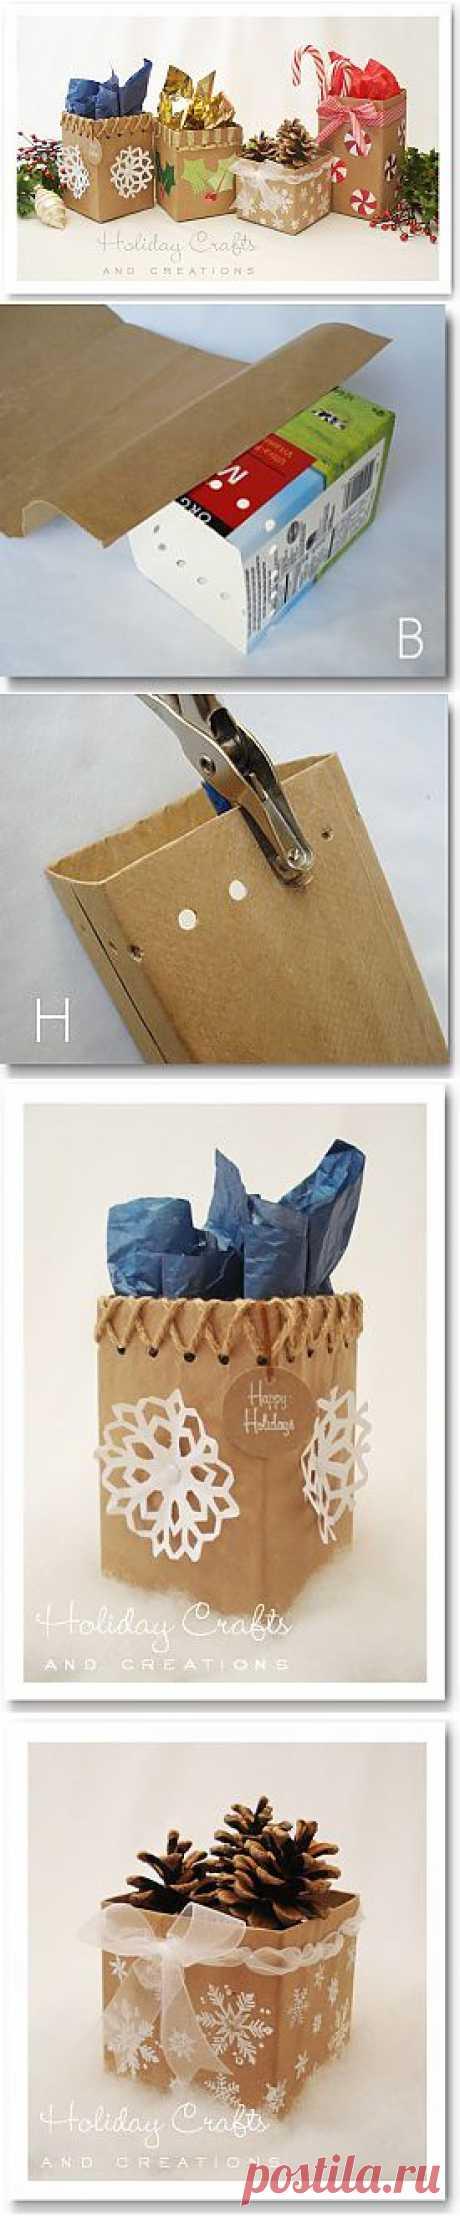 Новогодние корзинки для подарков.